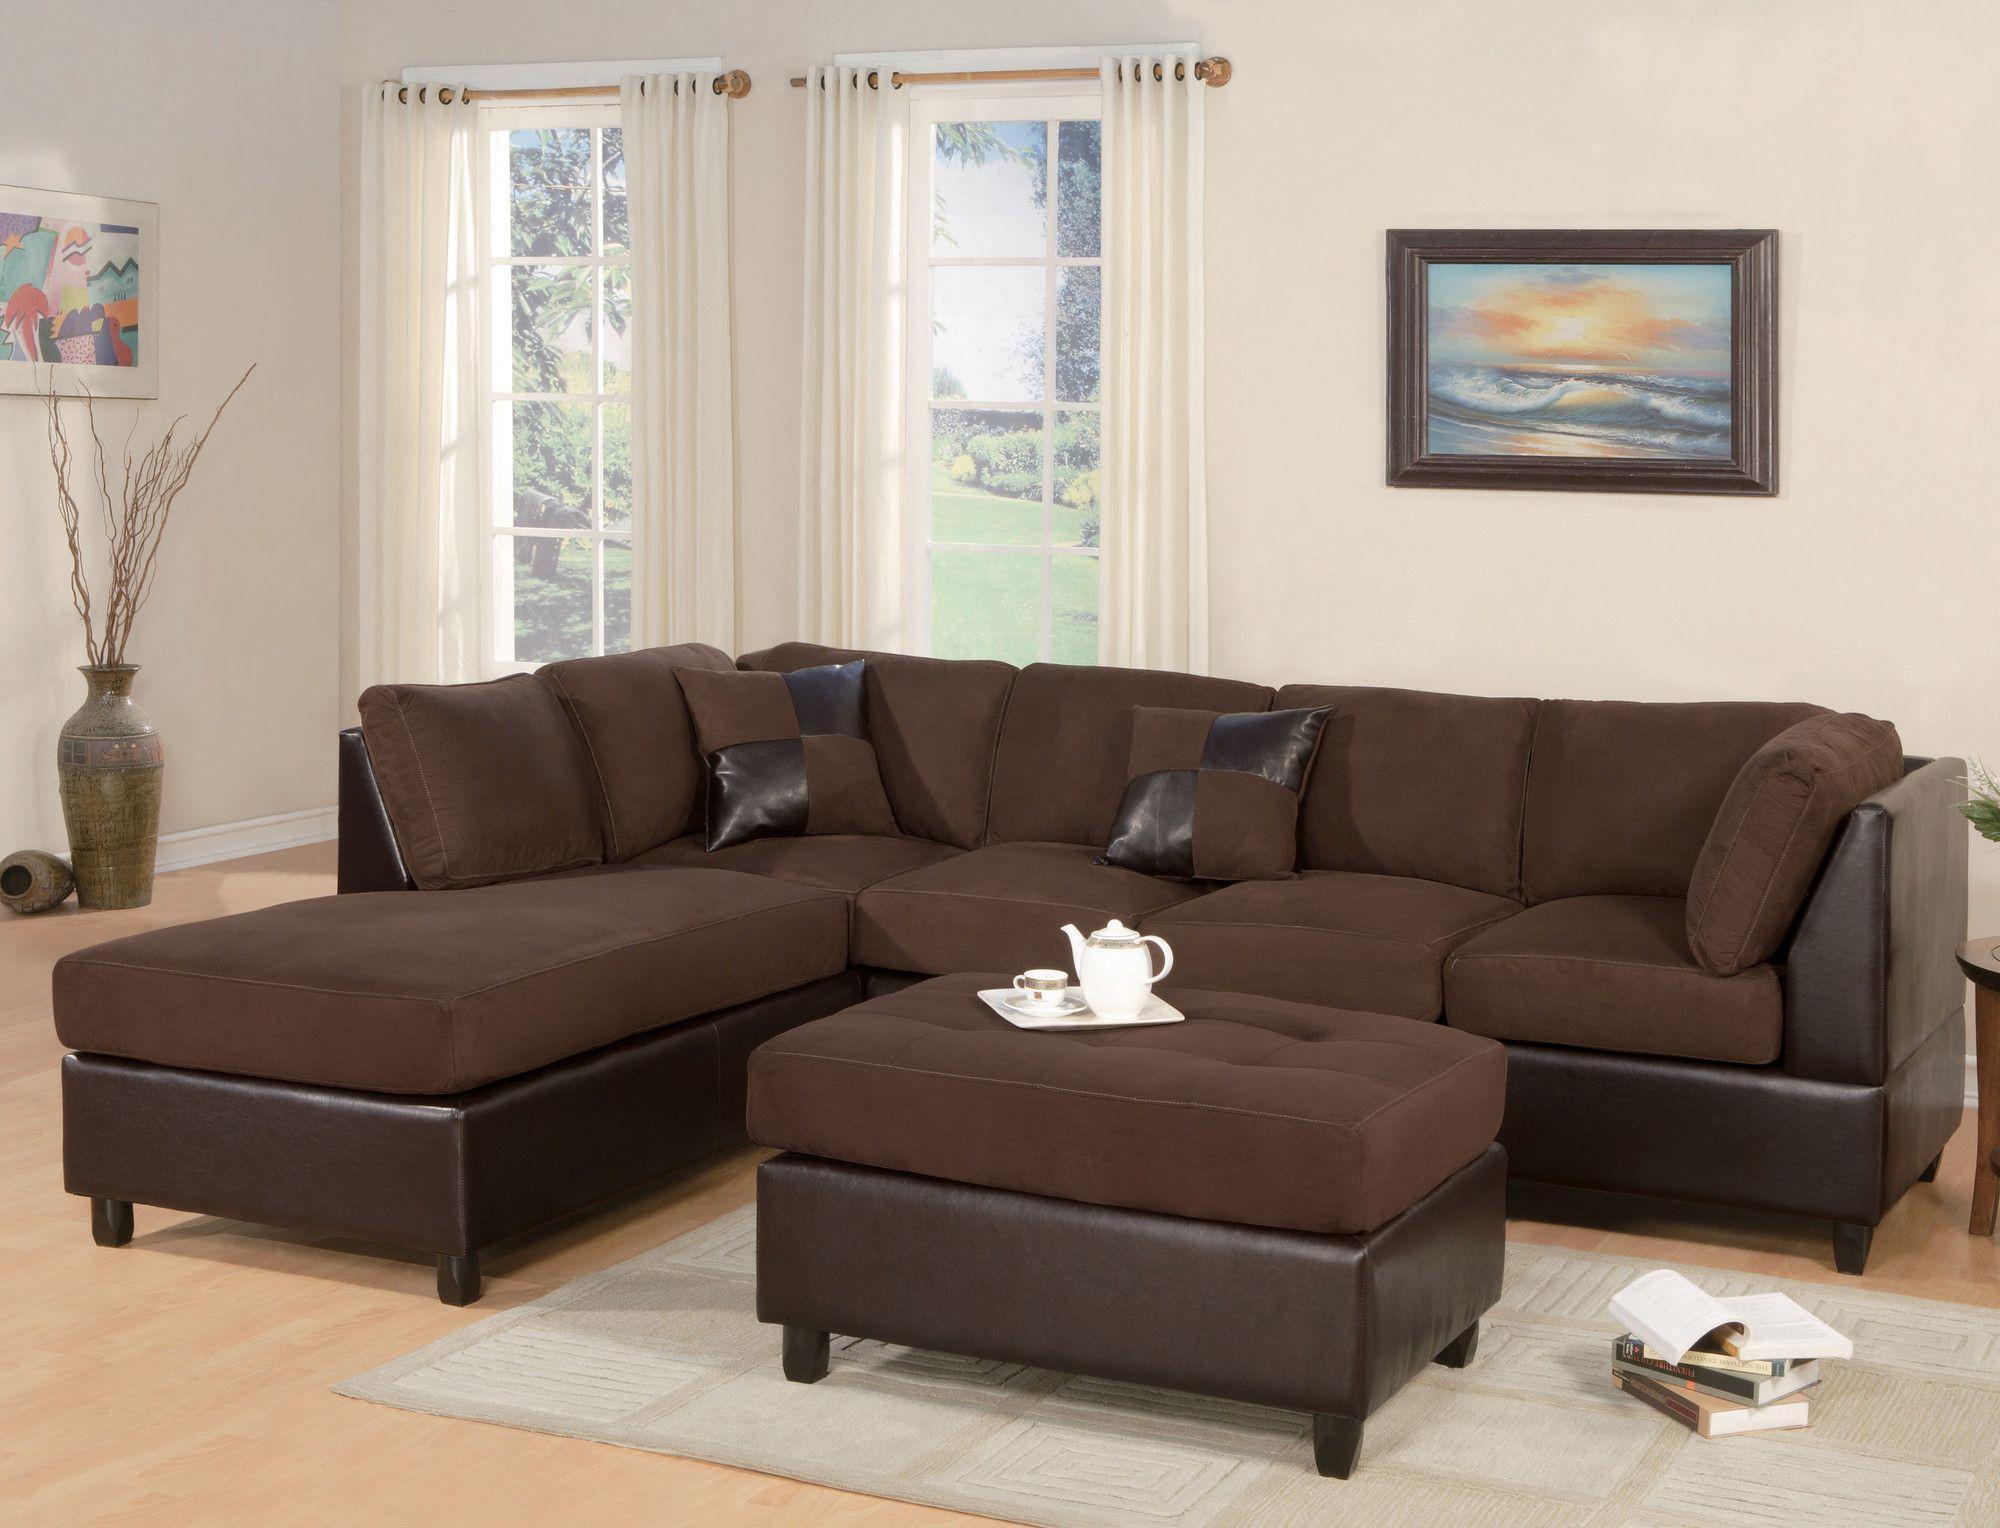 Liberty Reversible Sleeper Sectional Sectional Sofa Brown